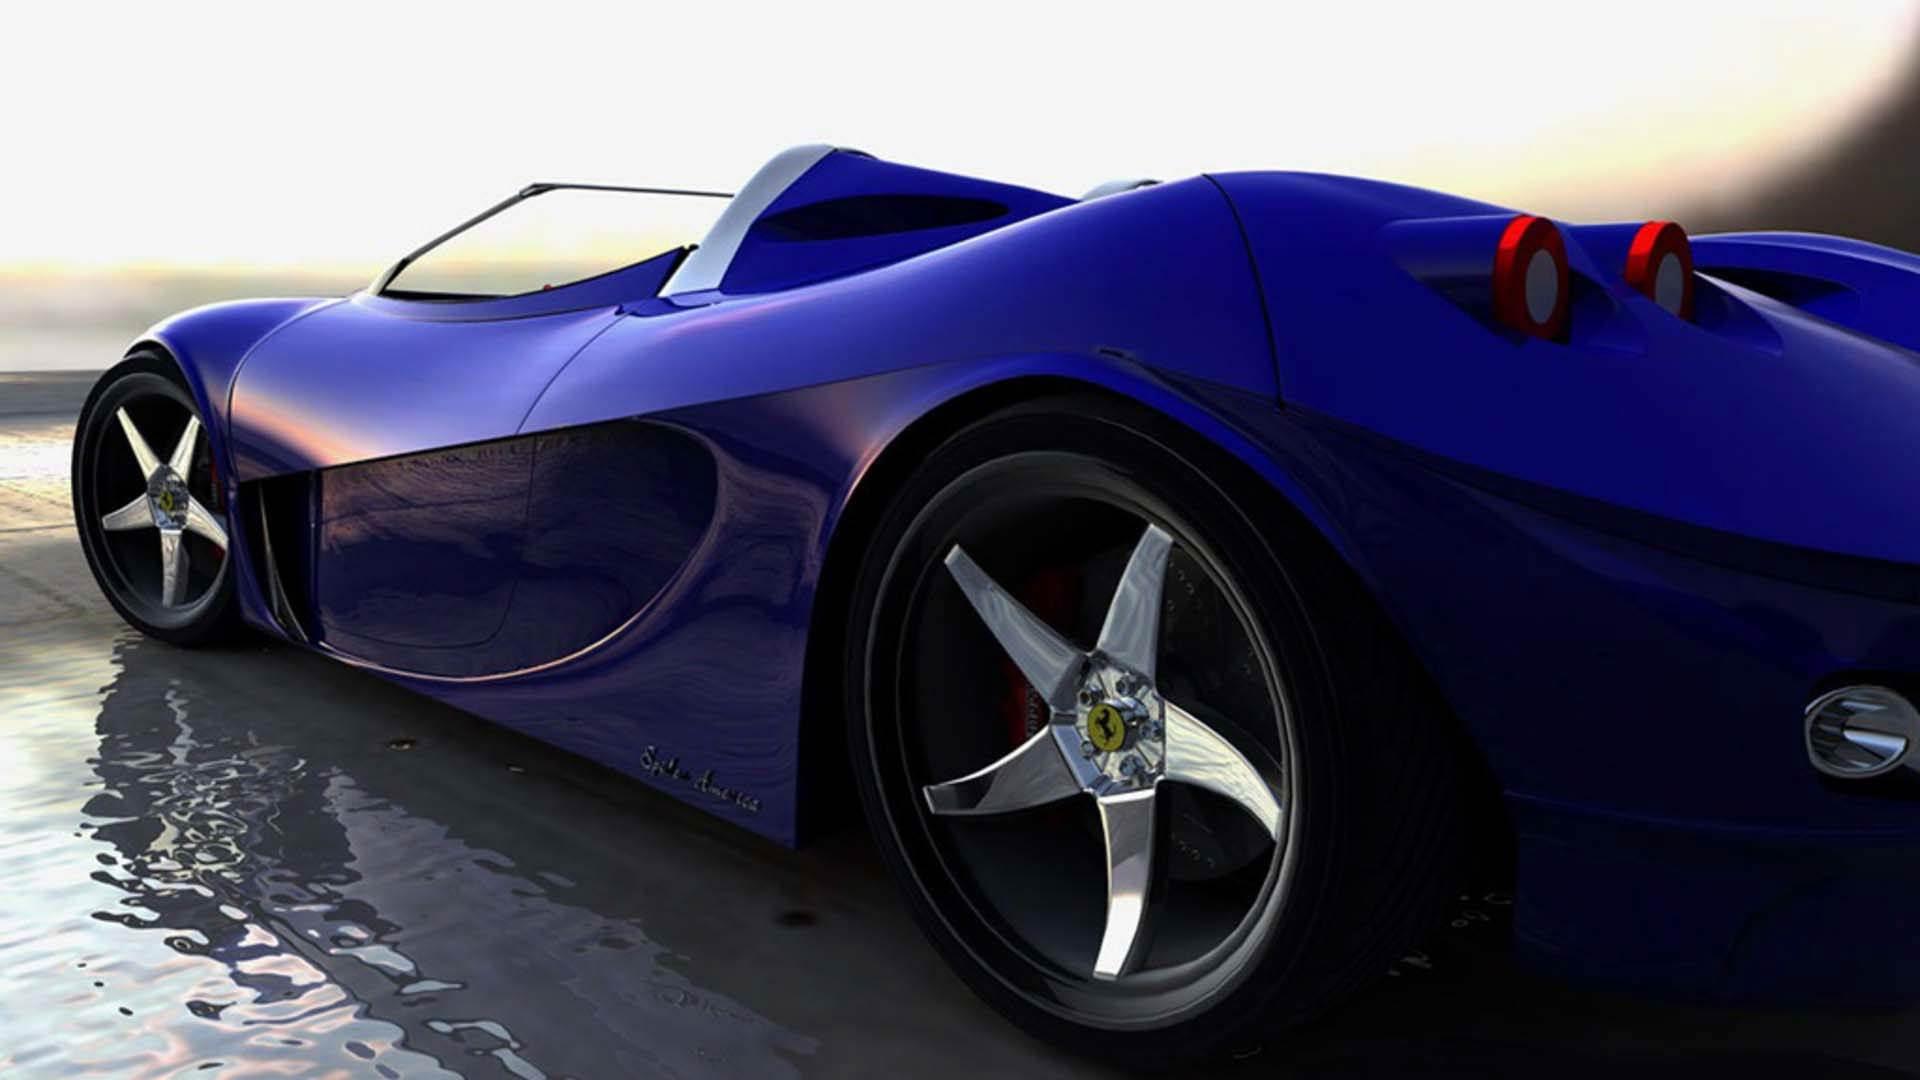 Wallpaper: Ferrari Cars HD Wallpapers